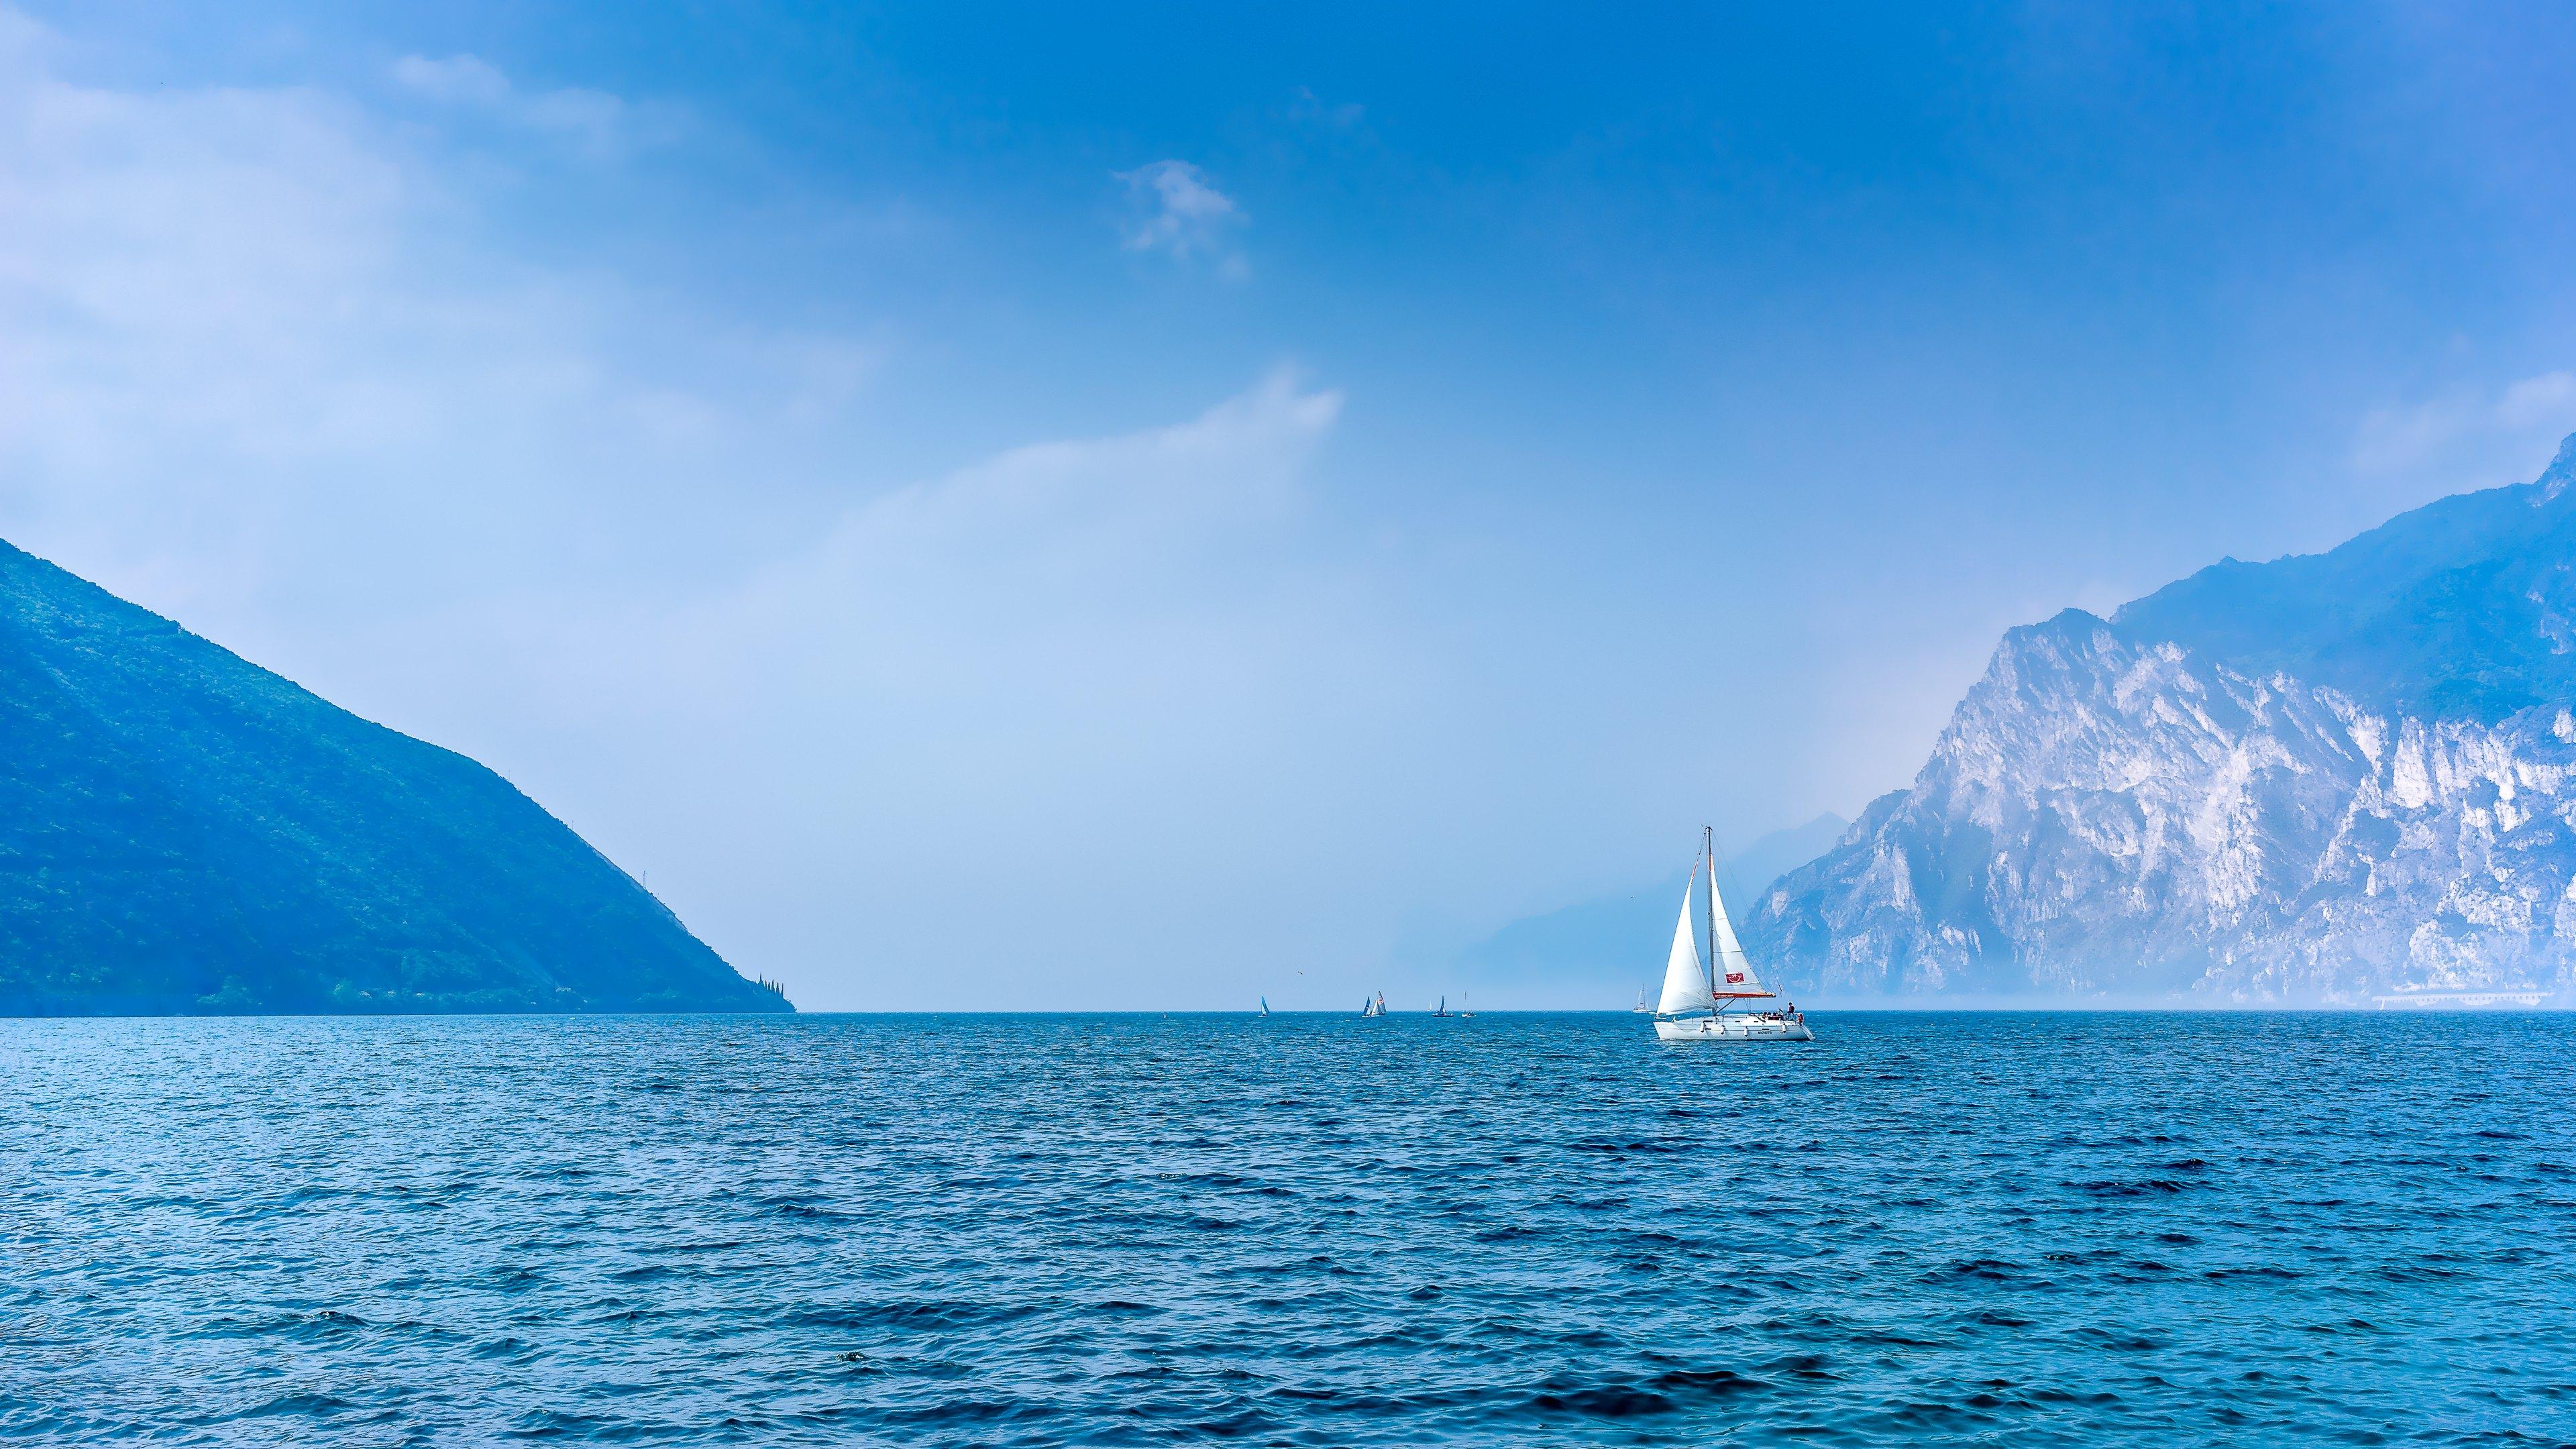 sailboat wallpaper background 59958